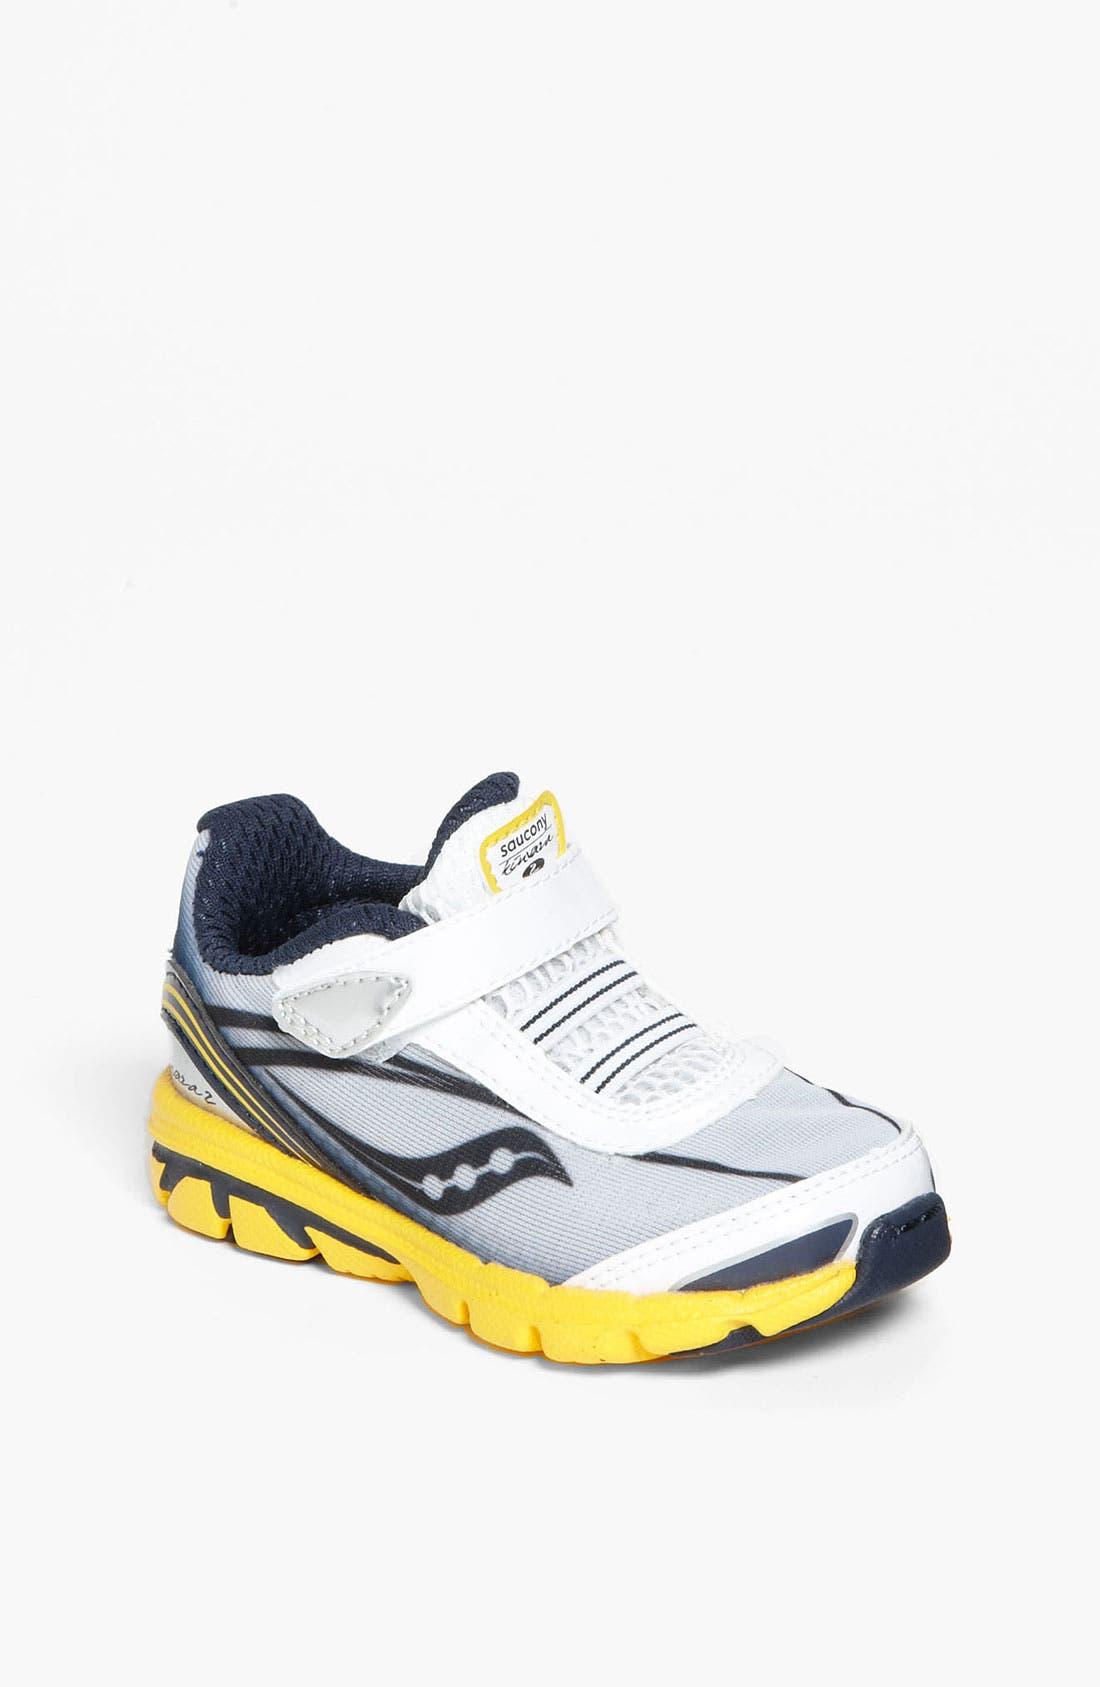 Alternate Image 1 Selected - Saucony 'Kinvara' Athletic Shoe (Baby, Walker & Toddler)